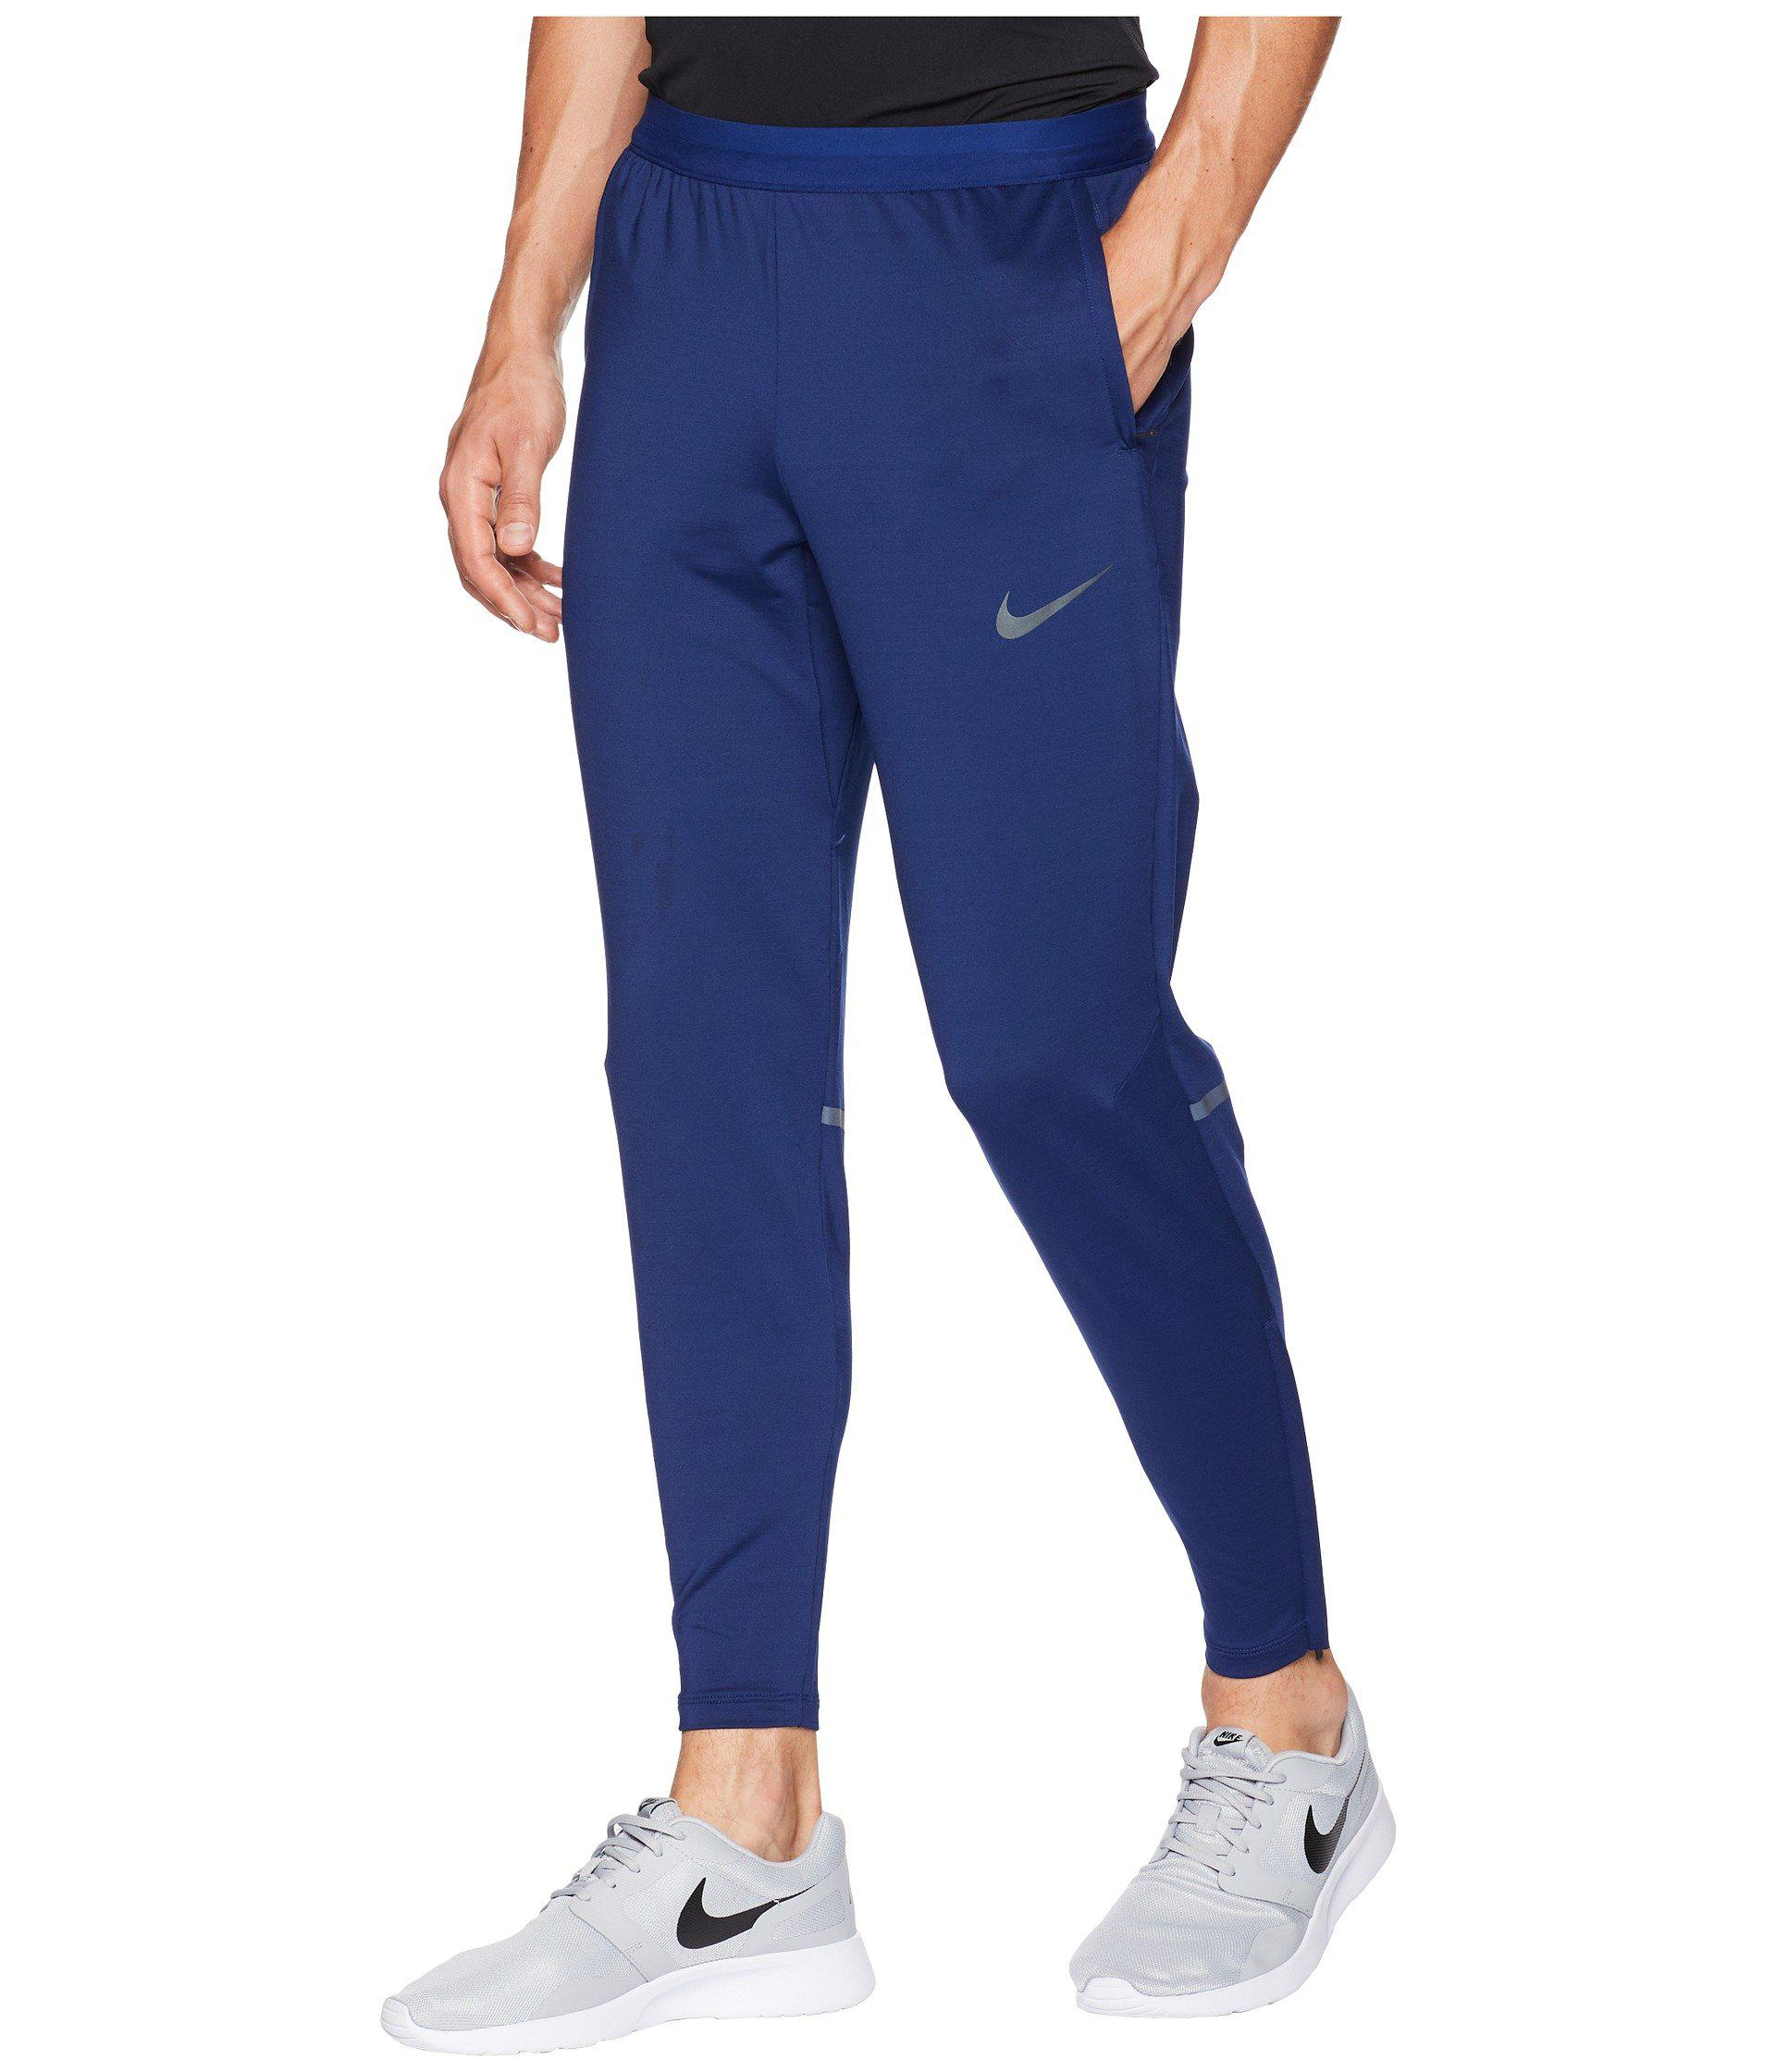 a9a0c83d5c2 Lyst - Nike Phenom Pants (black) Men s Casual Pants in Blue for Men